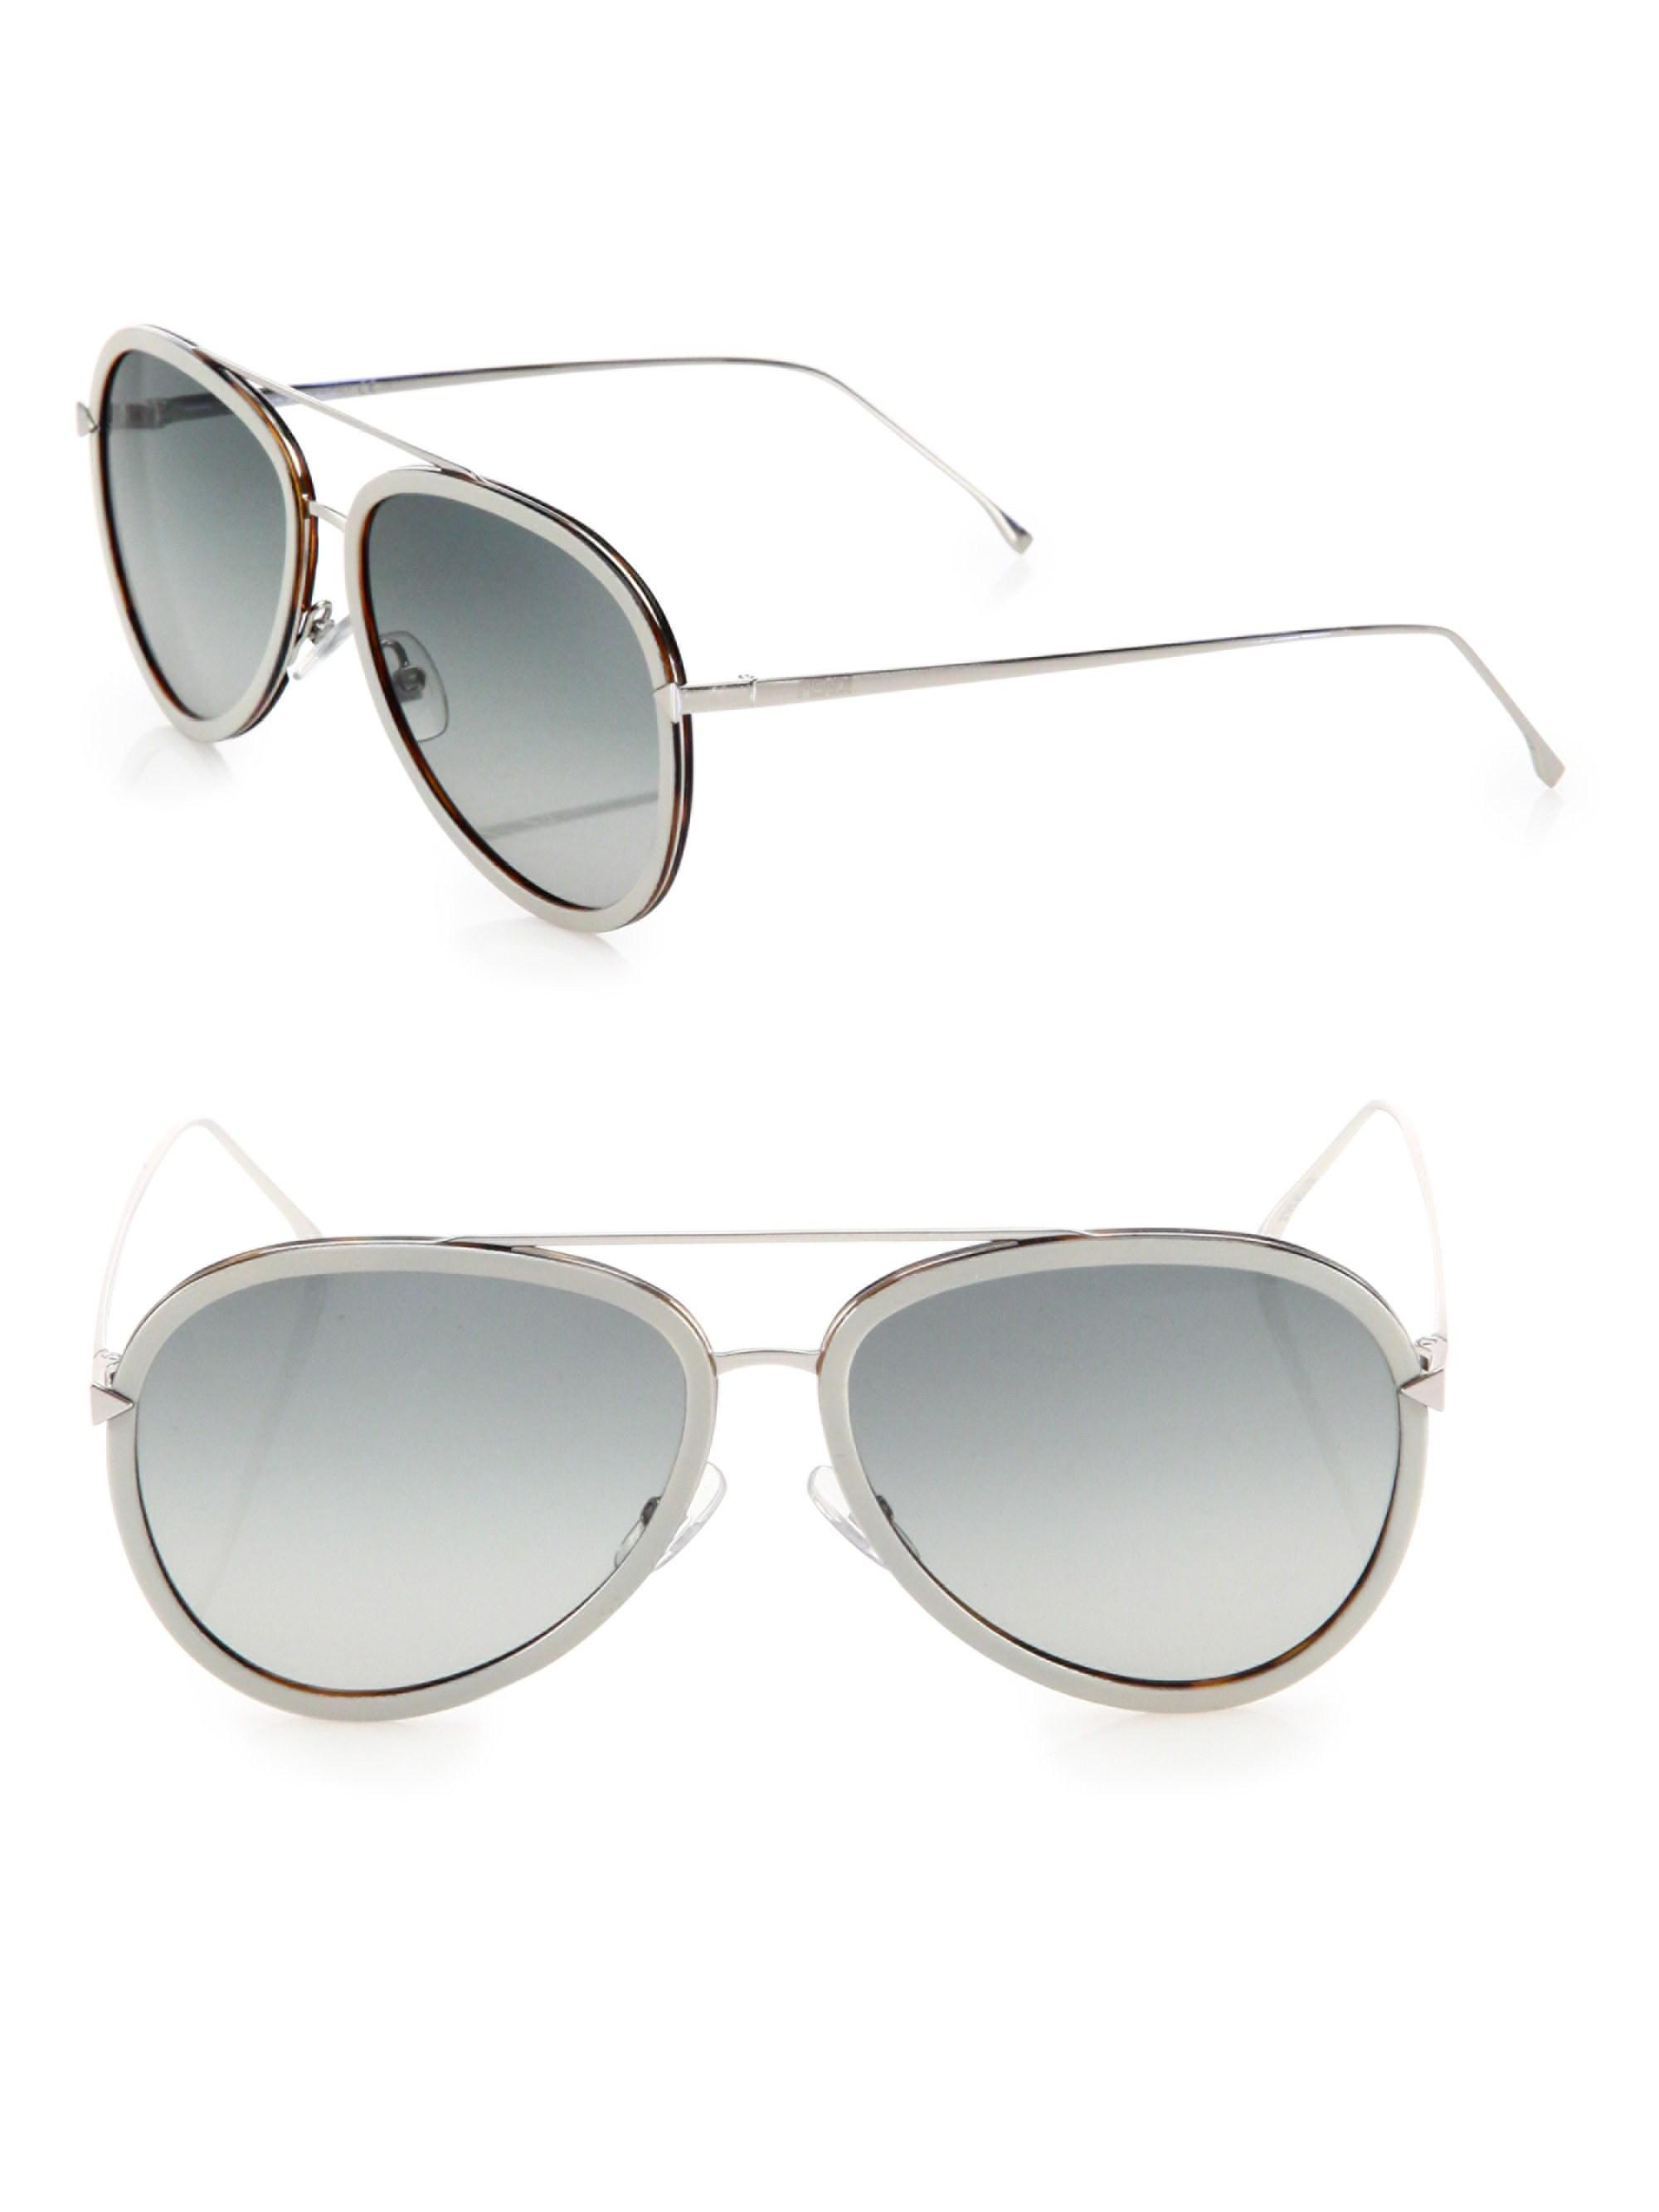 8e99f1a8e3 Lyst - Fendi Women s 57mm Aviator Sunglasses - Black in Black